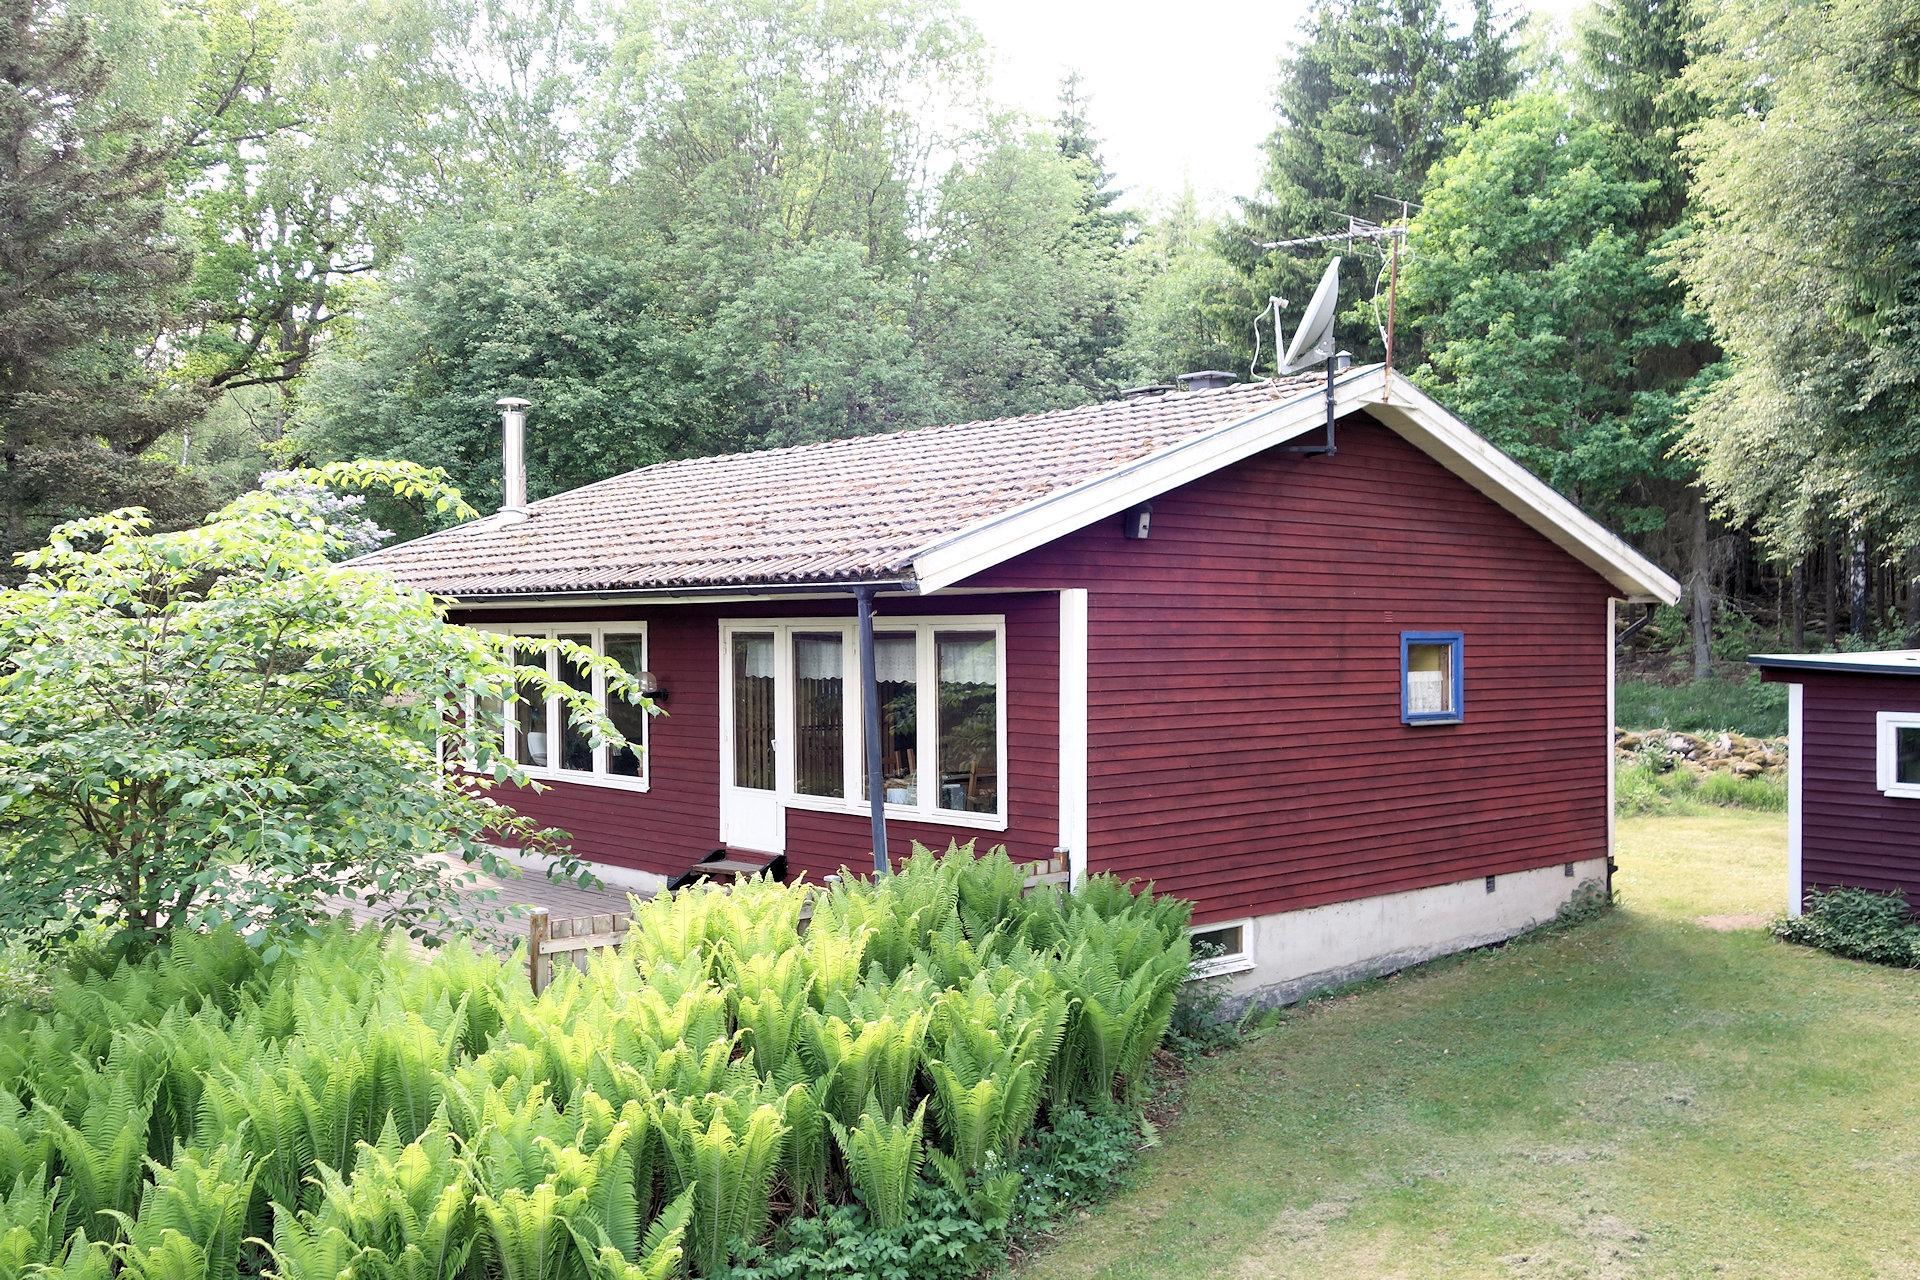 gro e bildergalerie aussen innen schweden immobilien online. Black Bedroom Furniture Sets. Home Design Ideas